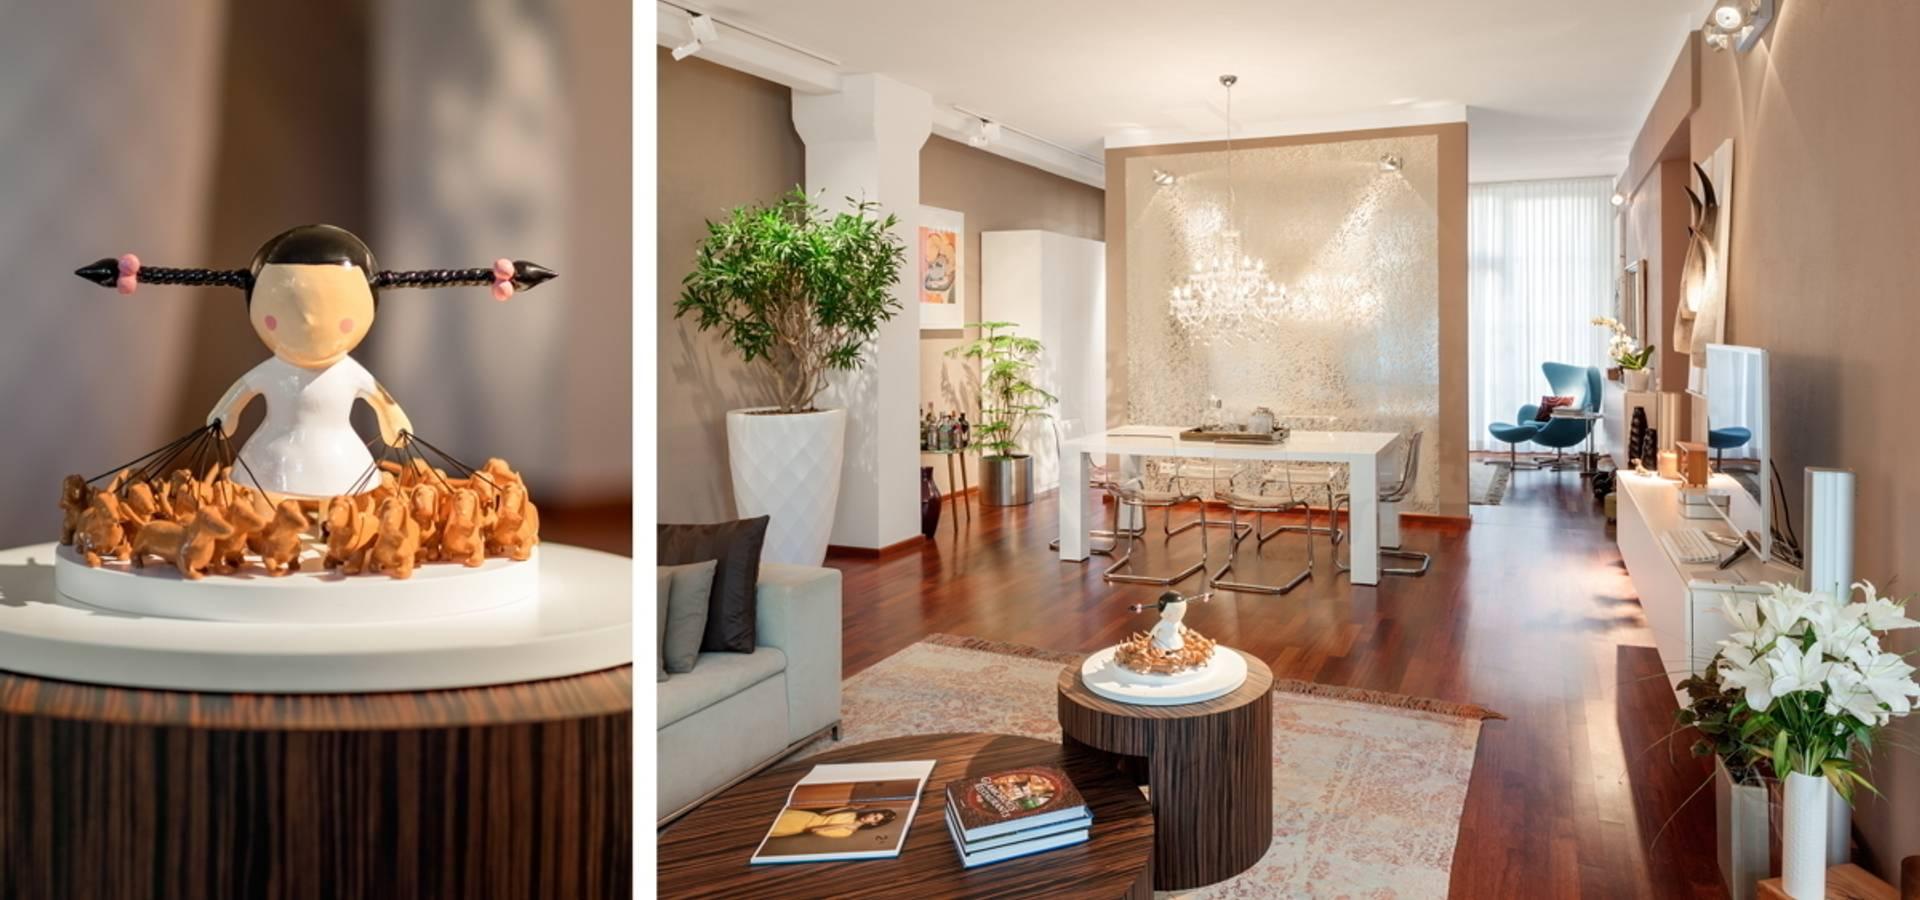 BERLINRODEO interior concepts GmbH